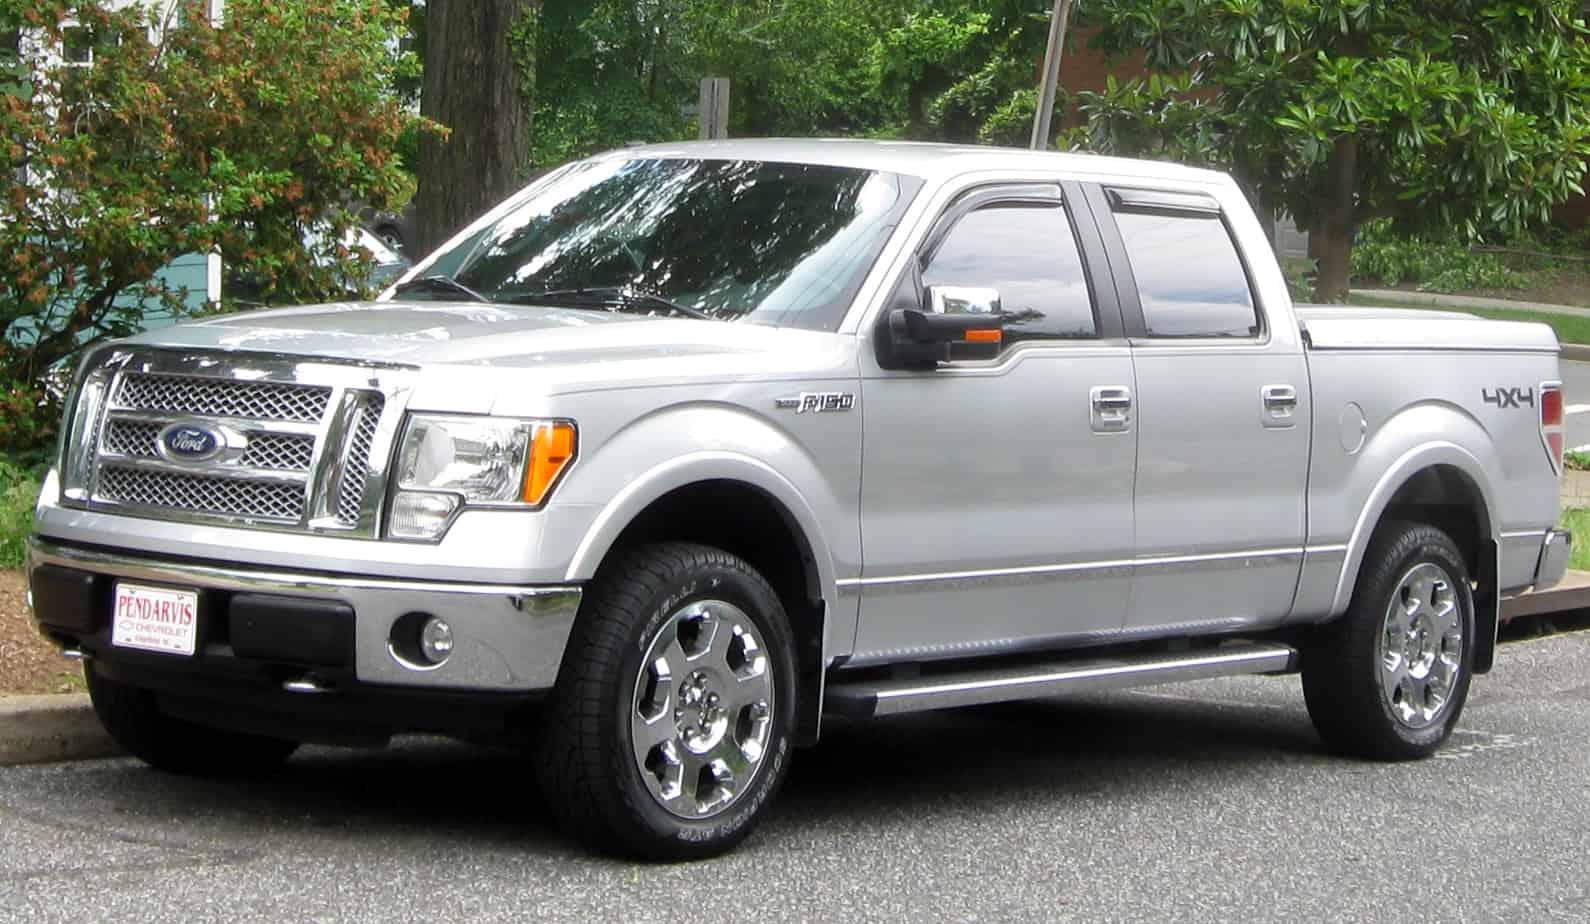 f150 ford truck